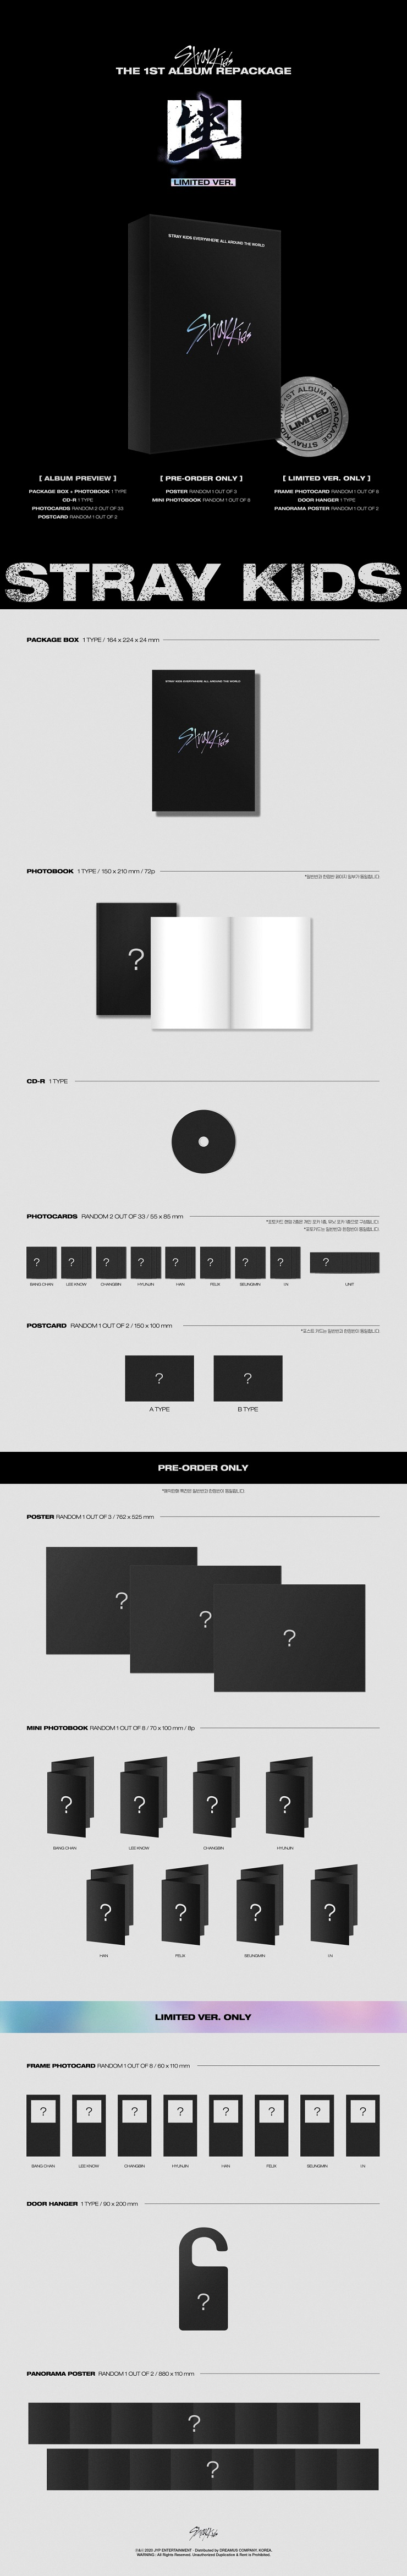 STRAY KIDS(스트레이키즈) - 1집 리패키지 IN生(IN LIFE) [한정반]